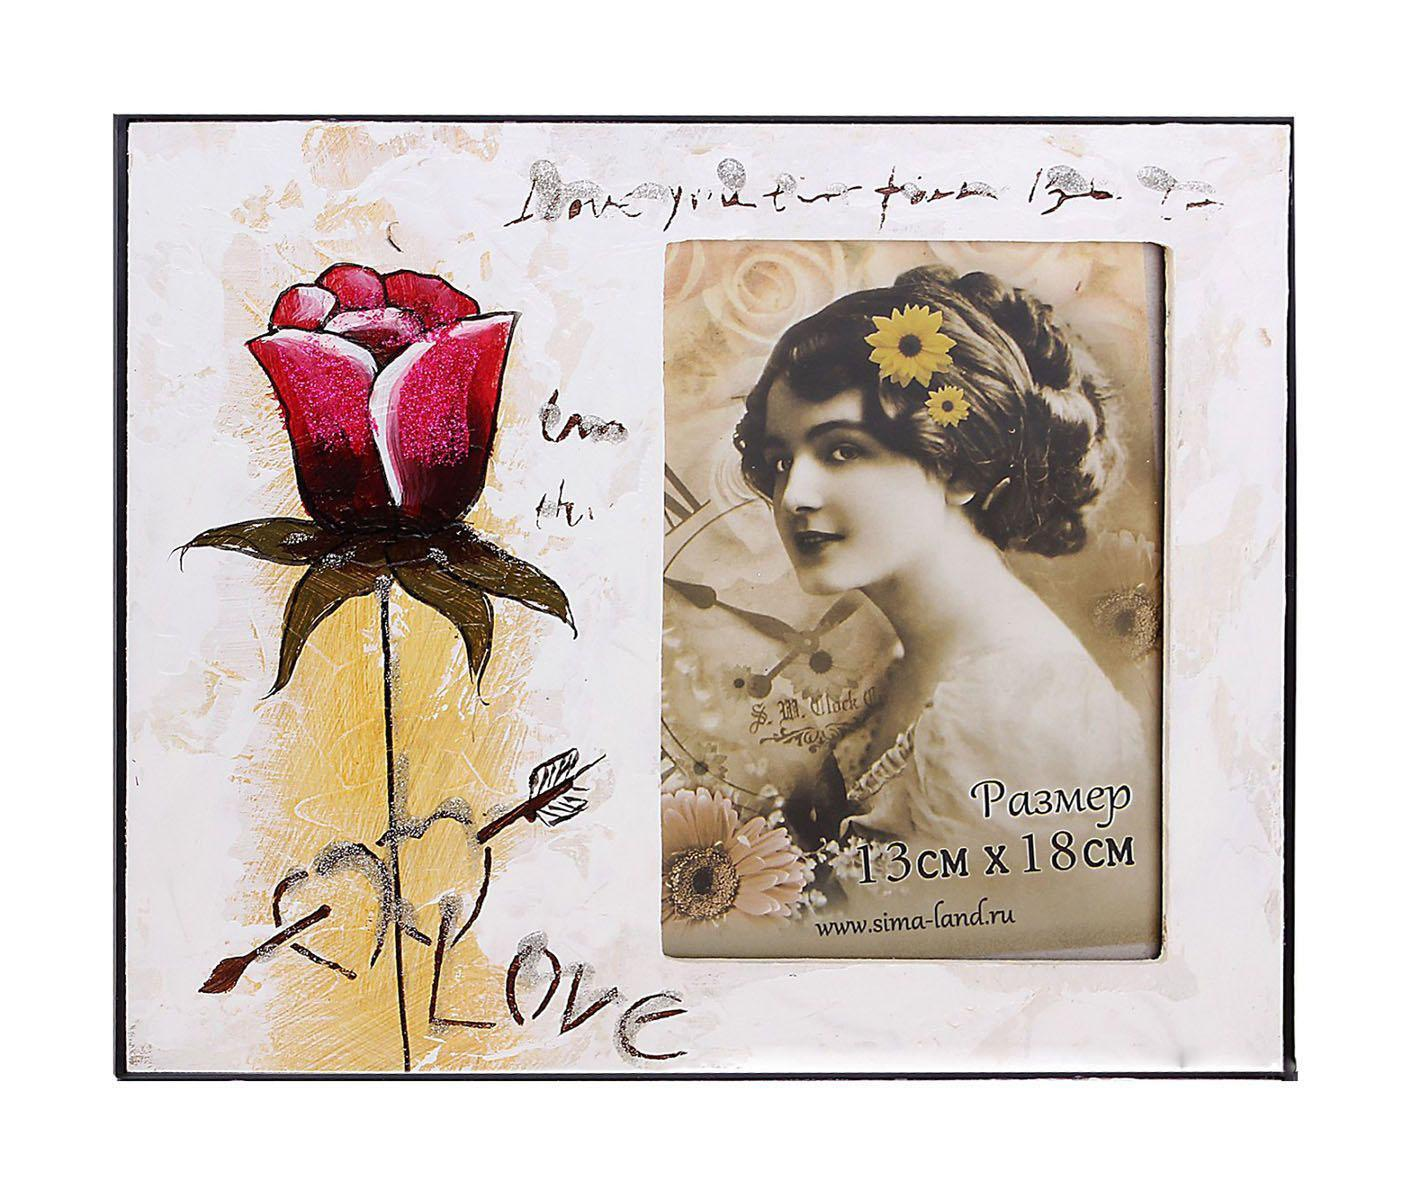 Фоторамка Sima-land Роза, 13 х 18 см ваза sima land серебряная роза высота 18 см